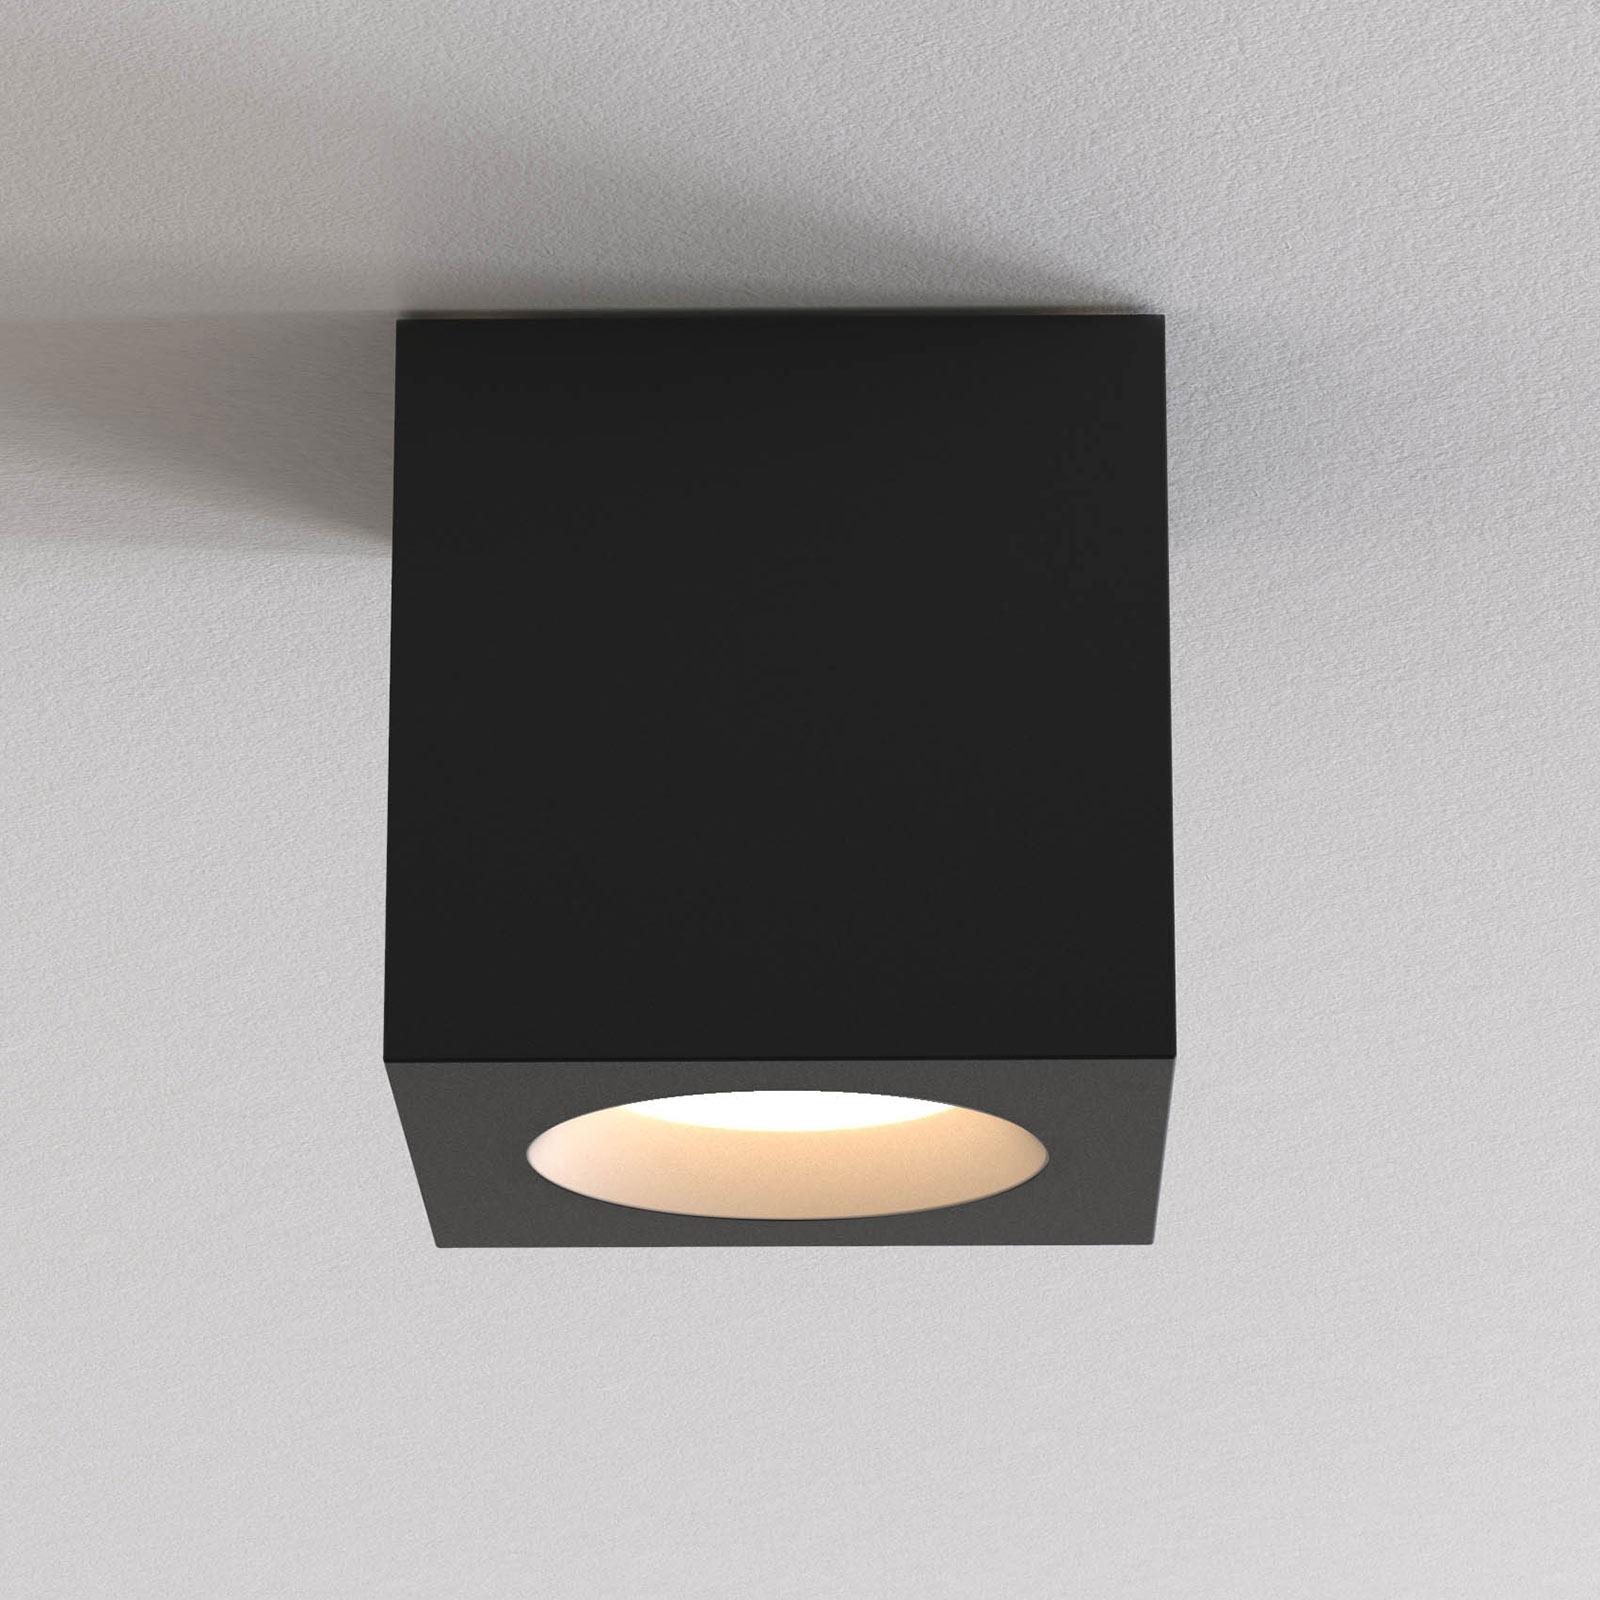 Astro Kos Square II lampa sufitowa, czarna